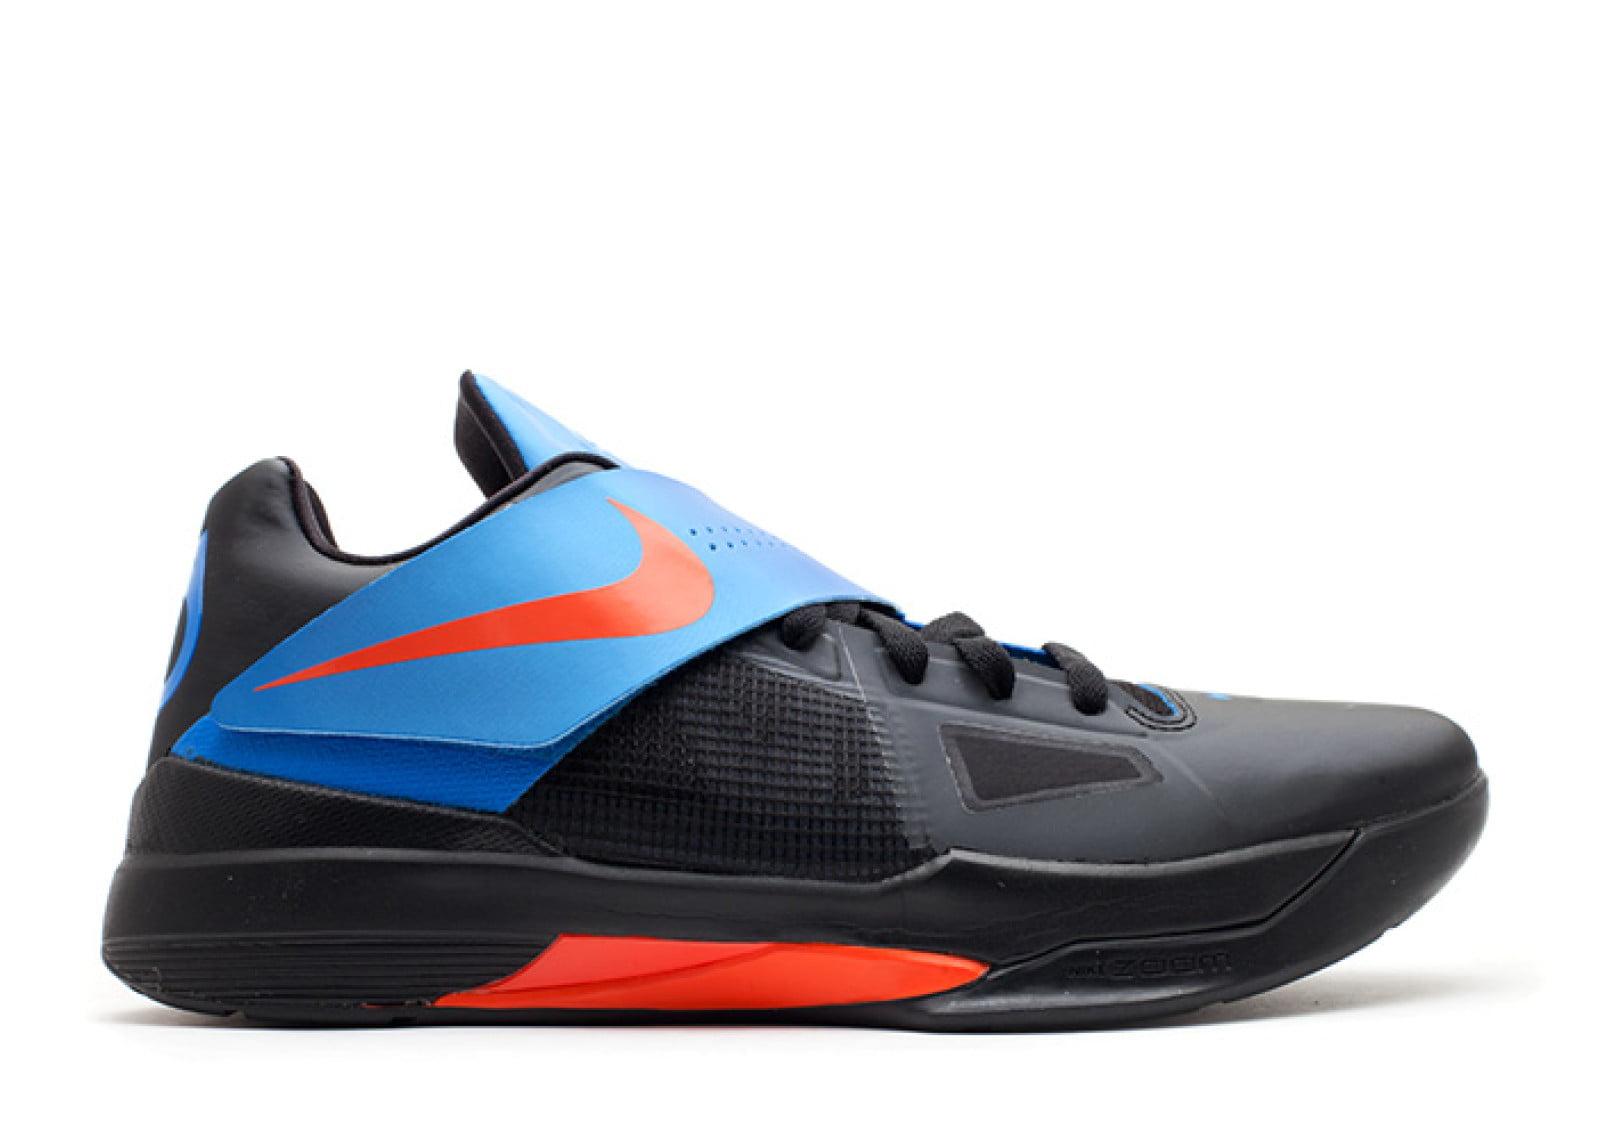 Nike - Men - Zoom Kd 4 - 473679-001